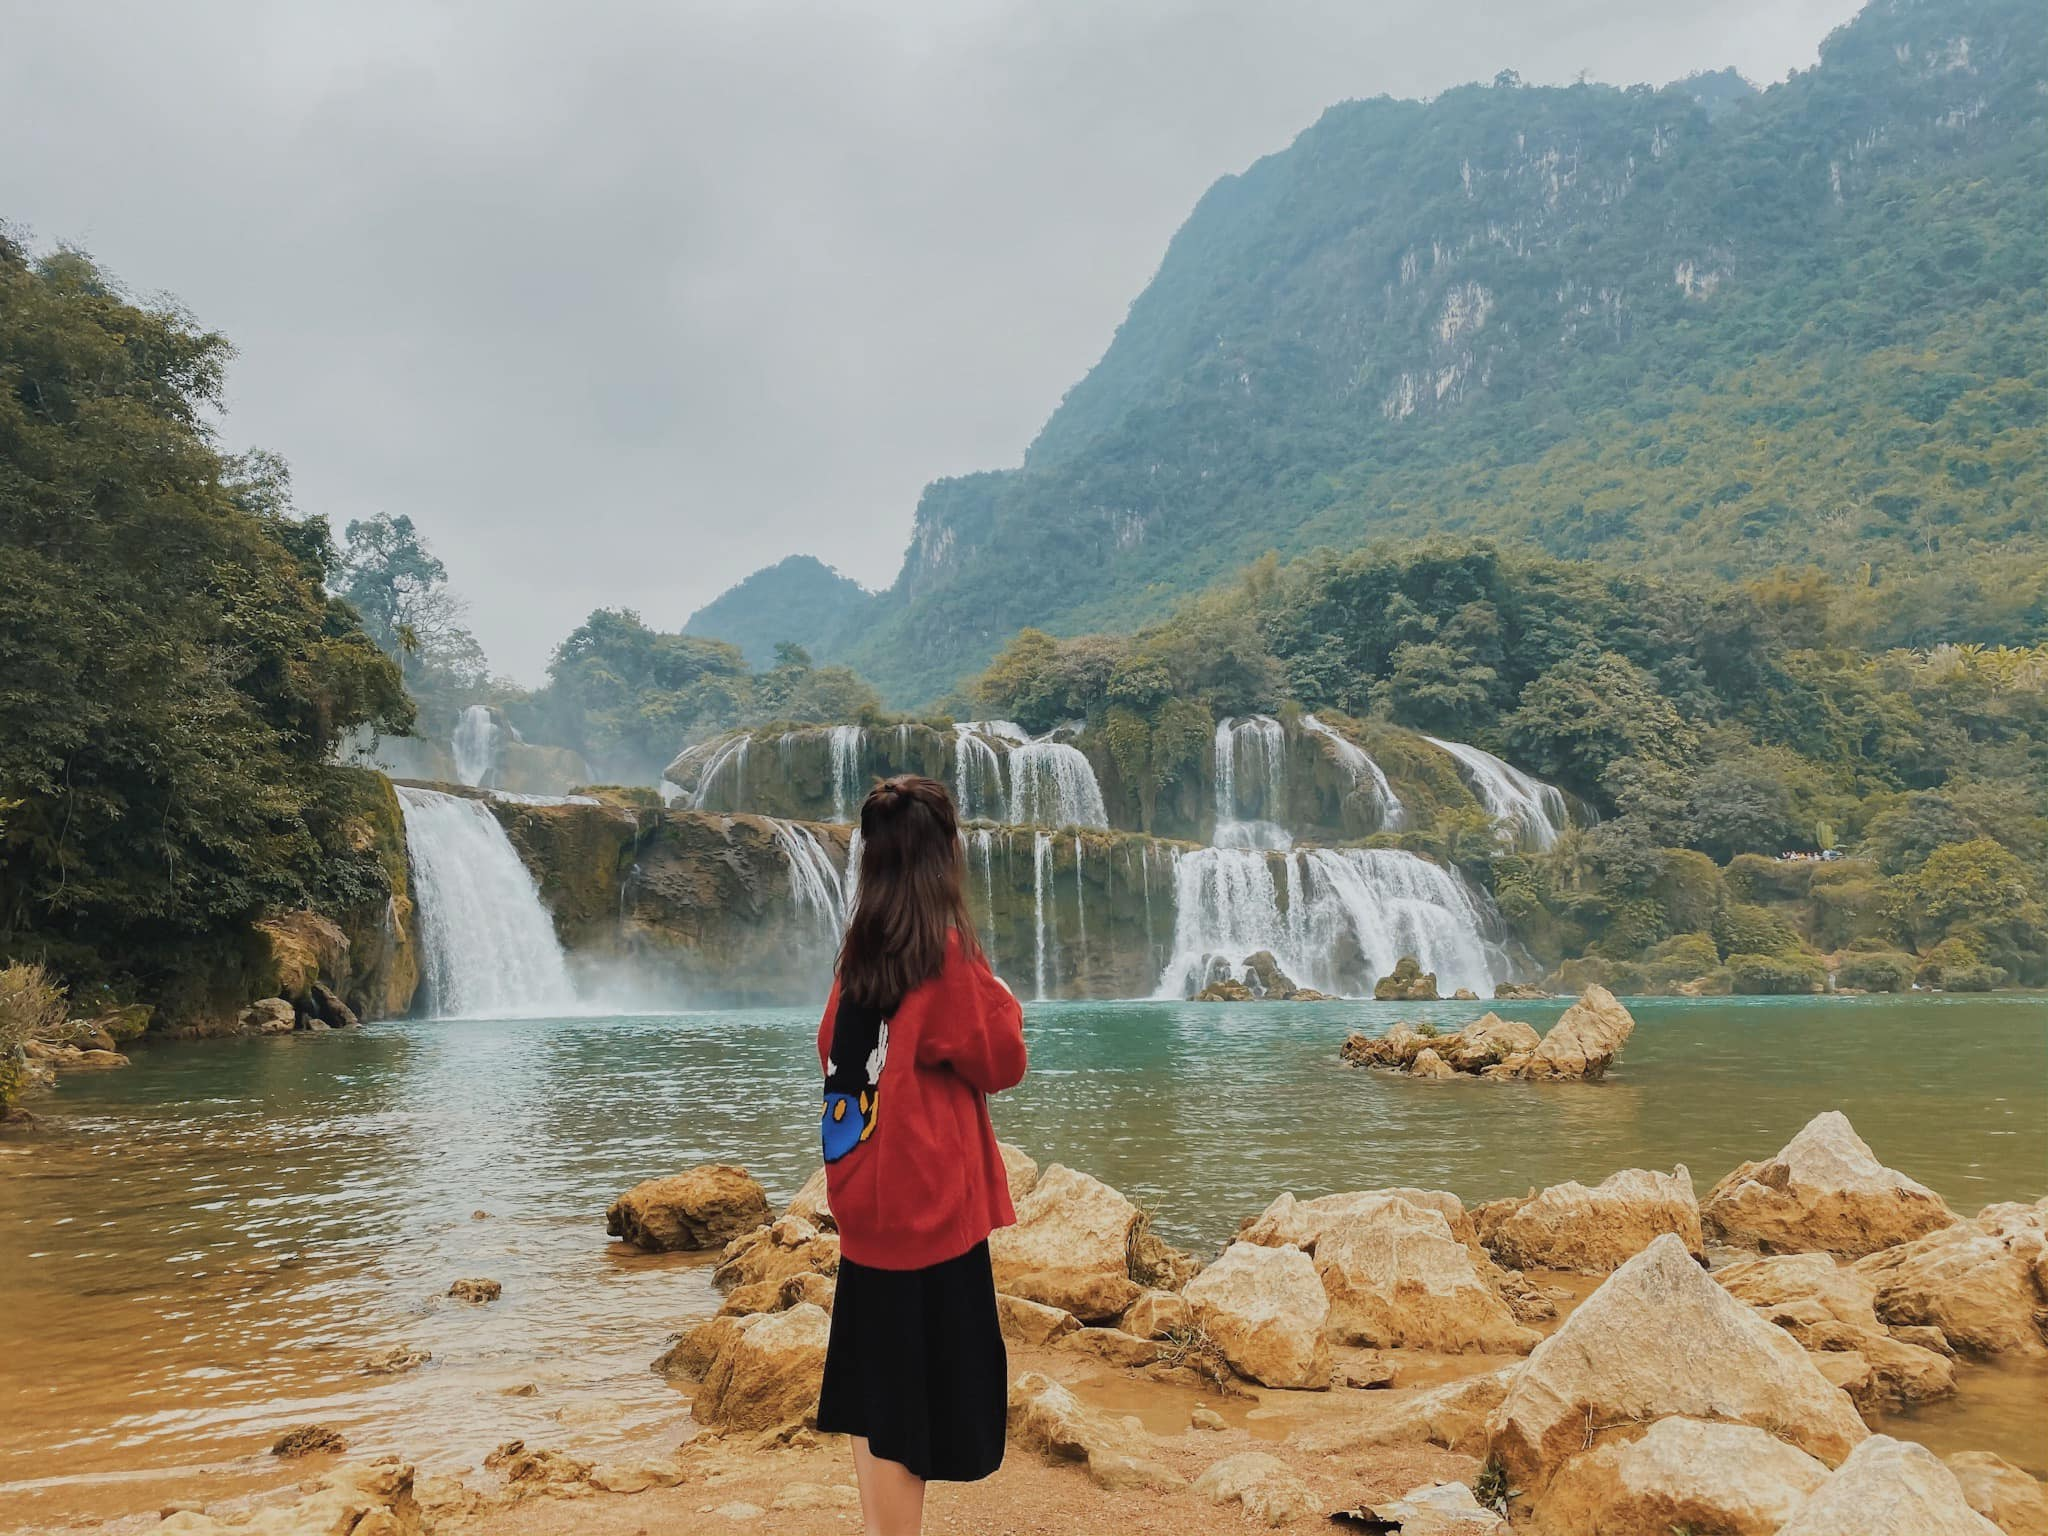 Tong-hop-nhung-dia-diem-du-lich-nui-hot-nhat-trong-dip-30-thang-4-vietmountain-travel21